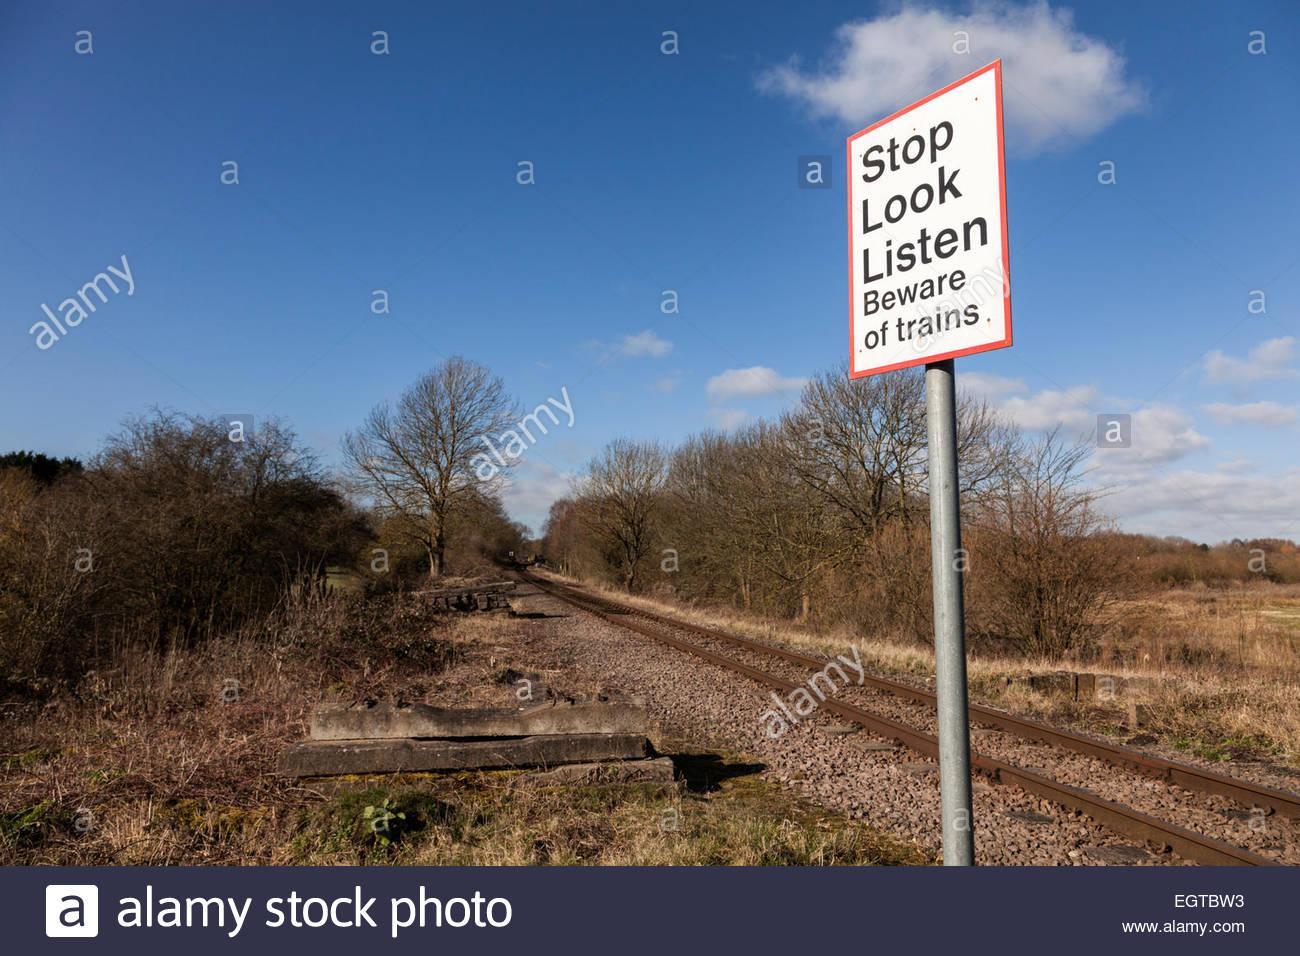 Stop Look Listen - Beware of Trains Sign - Stock Image